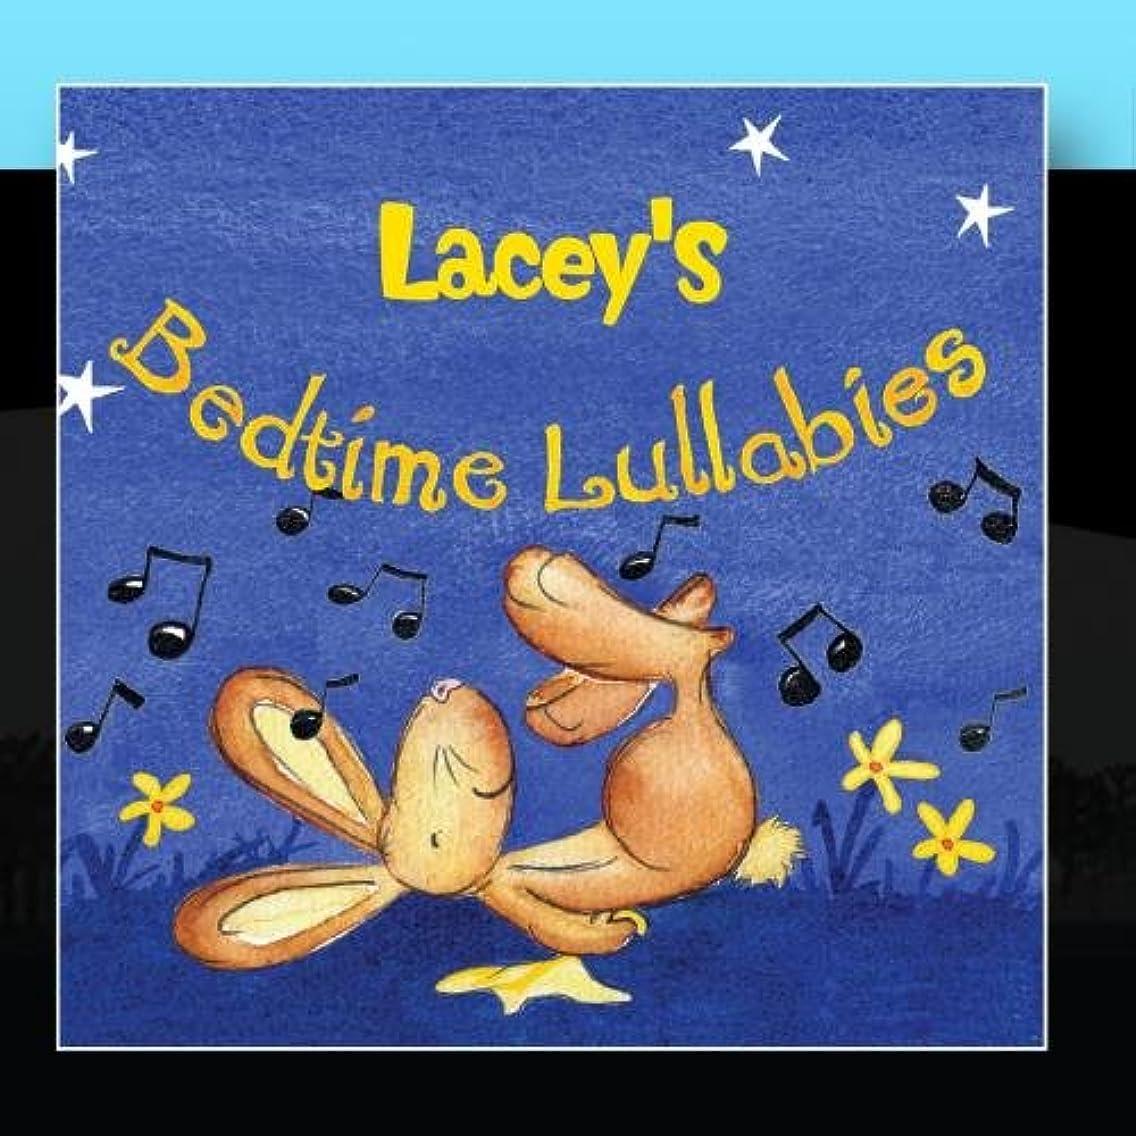 Lacey's Bedtime Lullabies